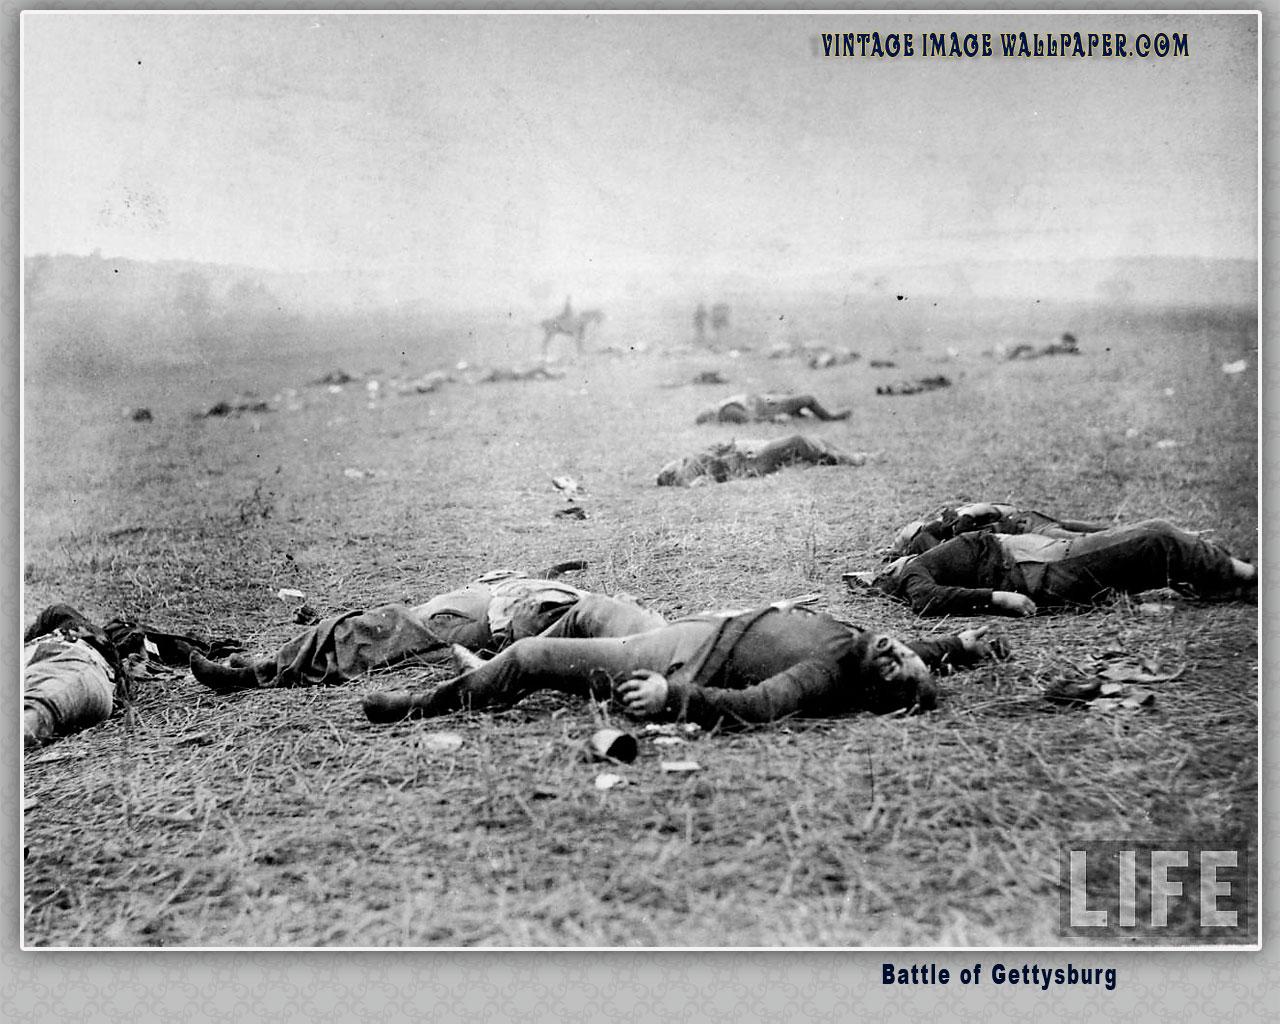 Battle of Gettysburg 01 Desktop Wallpaper in Vintage 1280x1024